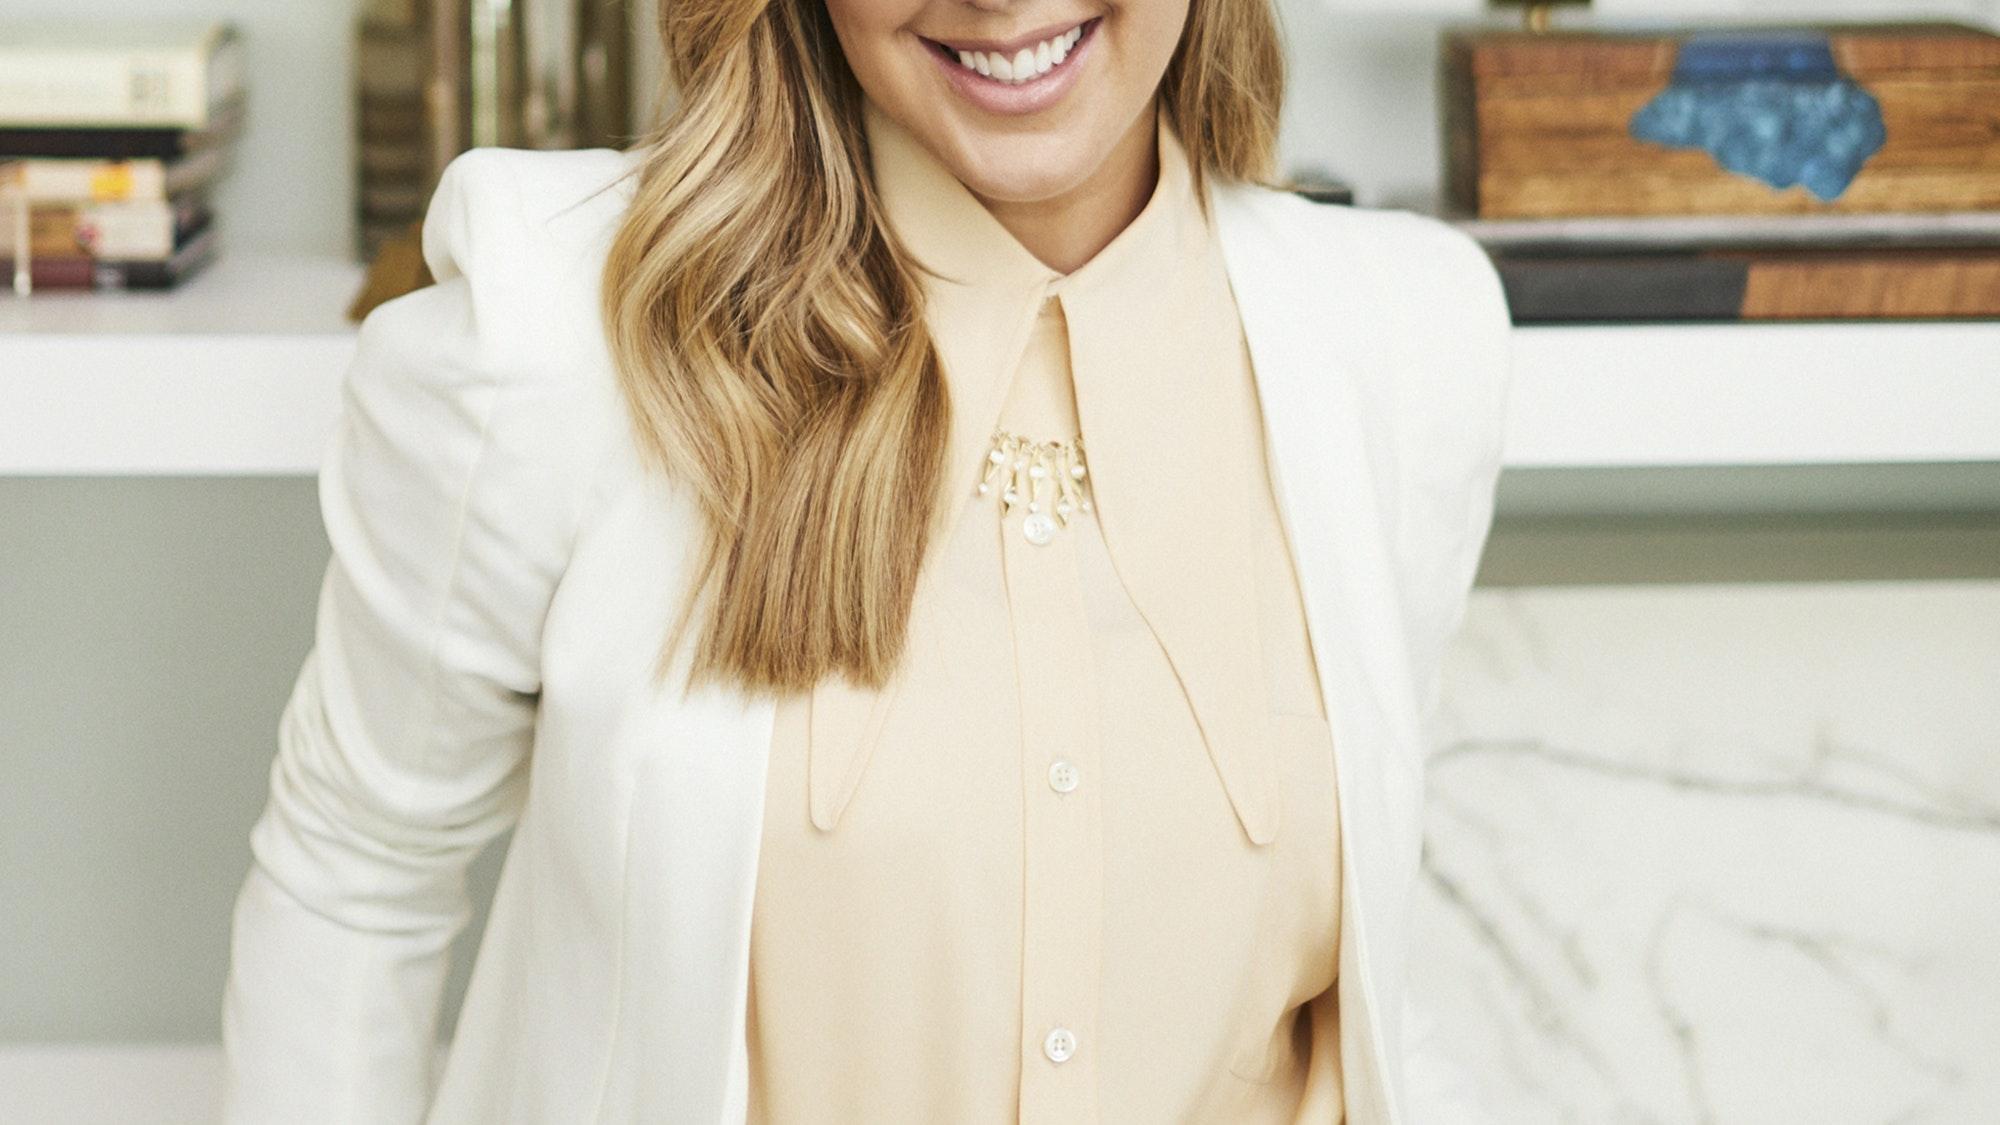 Jewelry Designer Kendra Scott's Secrets to Gorgeous Skin and Creating a Billion-Dollar Brand